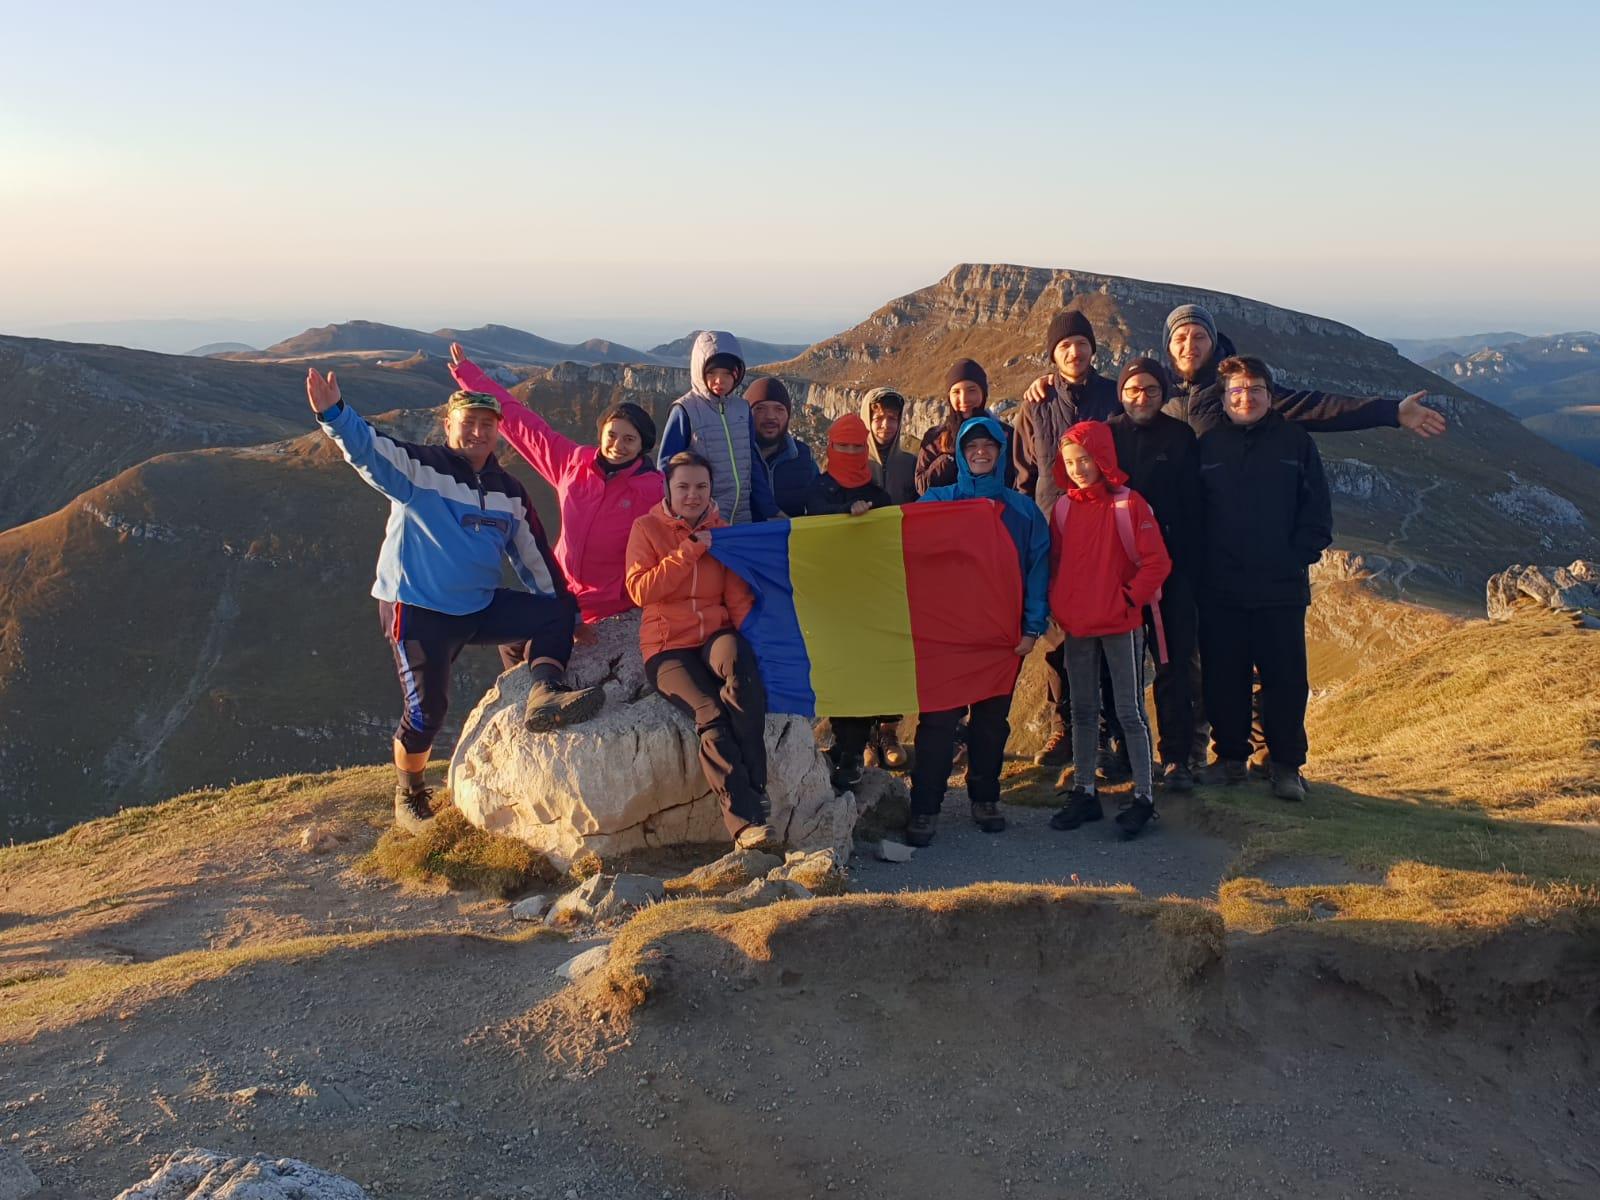 Excursie pe Vârful Omu (21-22 sept. 2019)